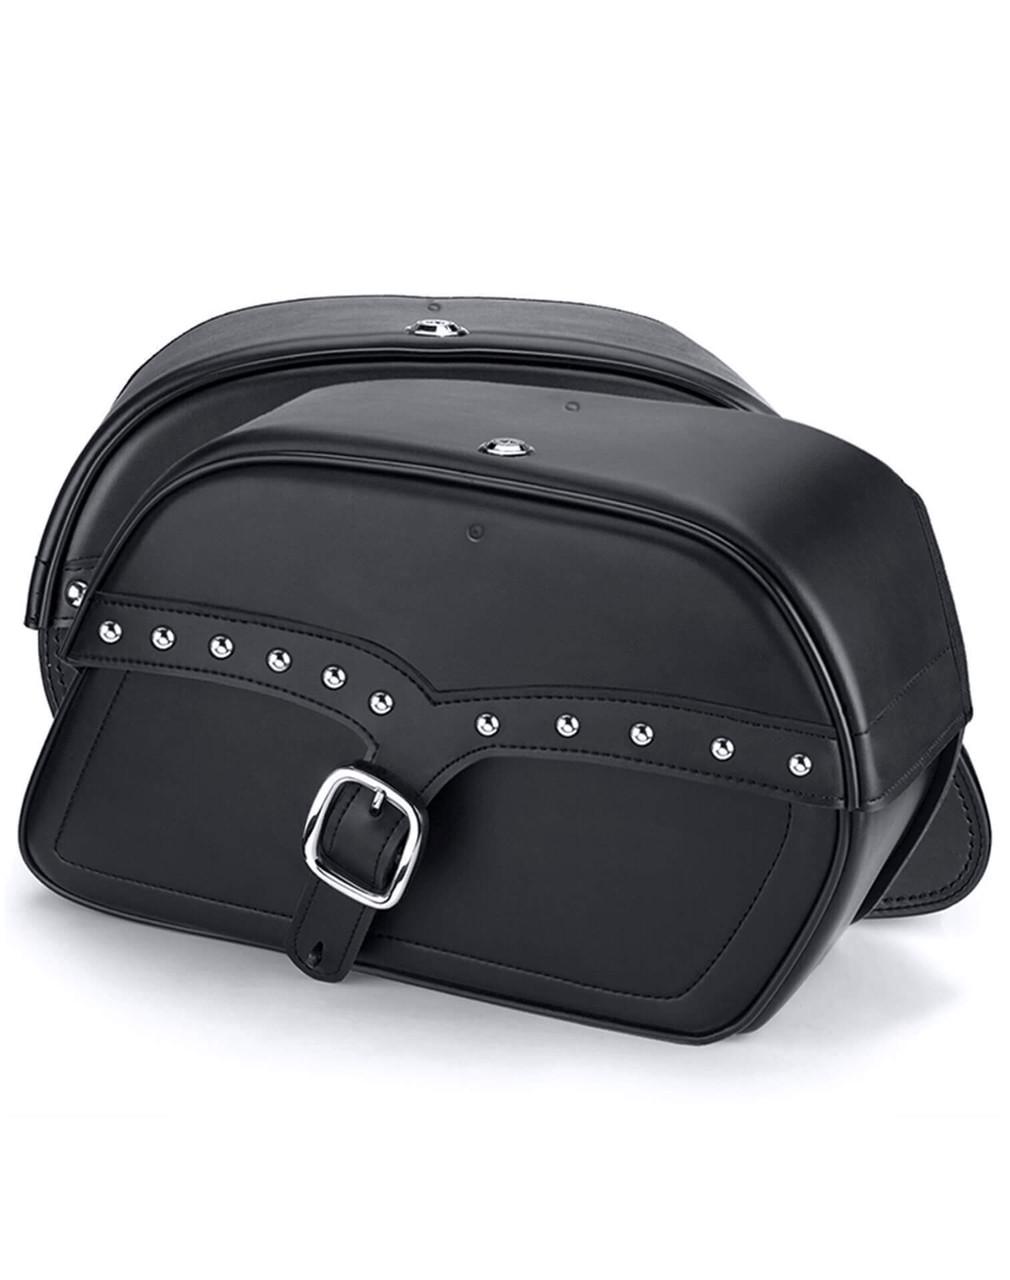 Yamaha Startoliner XV 1900 Medium Charger Single Strap Studded Motorcycle Saddlebags Both Bags View